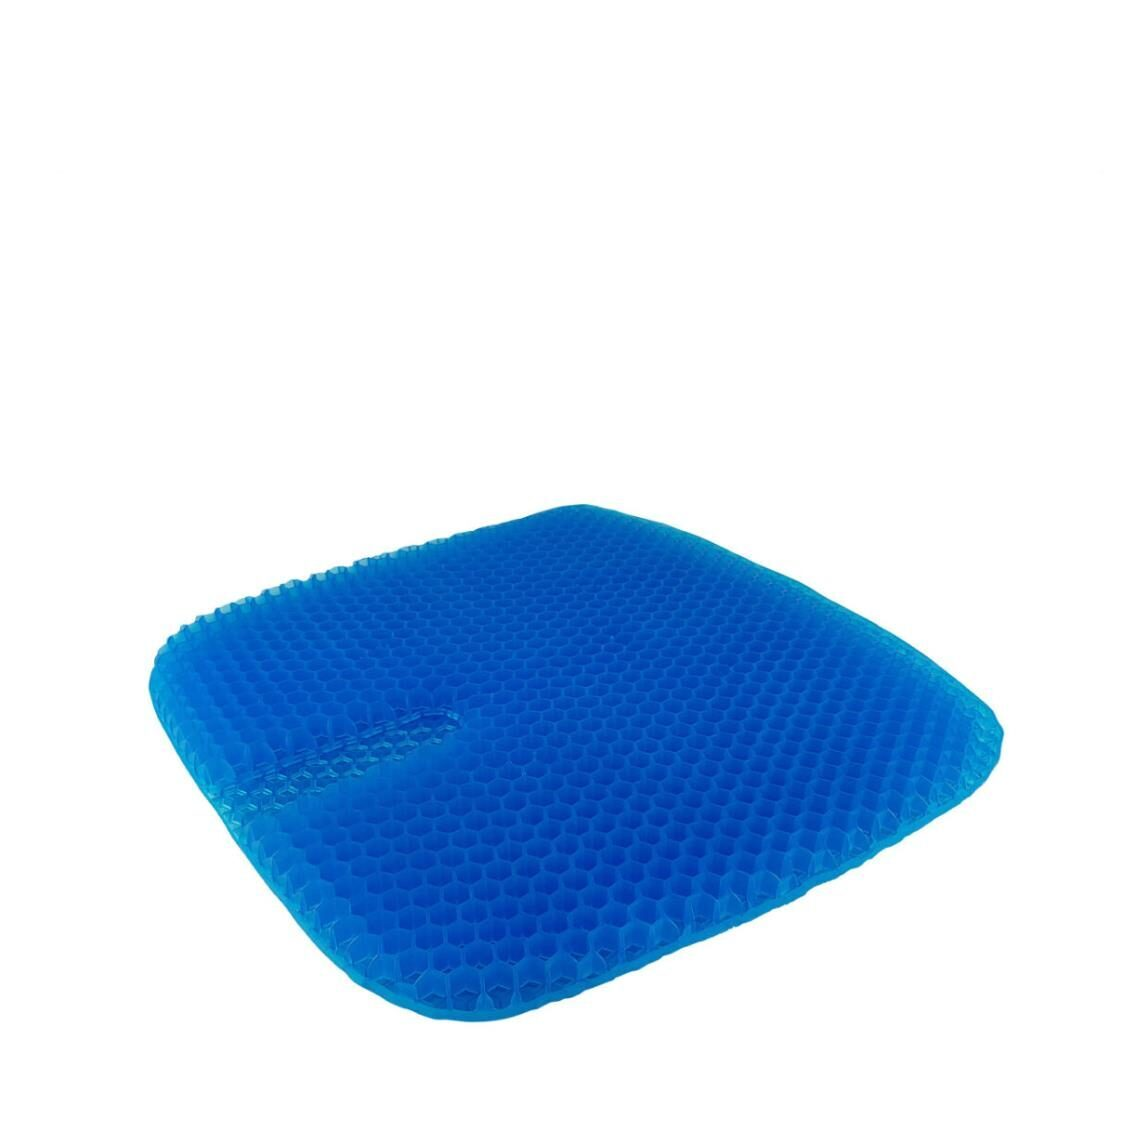 True Relief Honeycomb Cooling TPE Gel Seat Cushion Ocean Blue